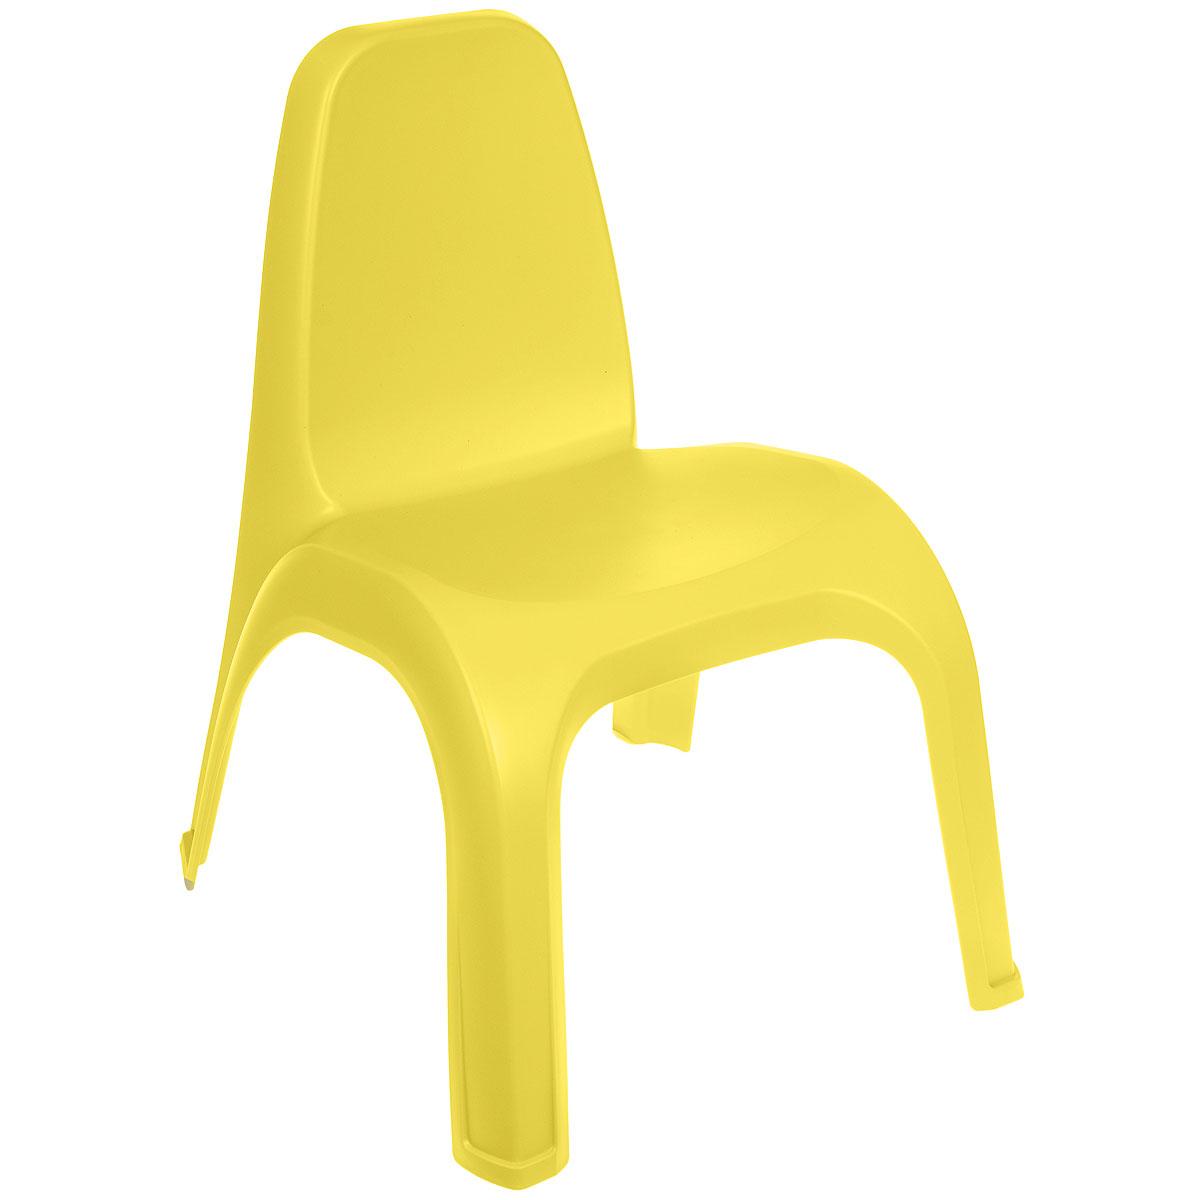 Стульчик детский Пластишка, цвет: желтый. С13601